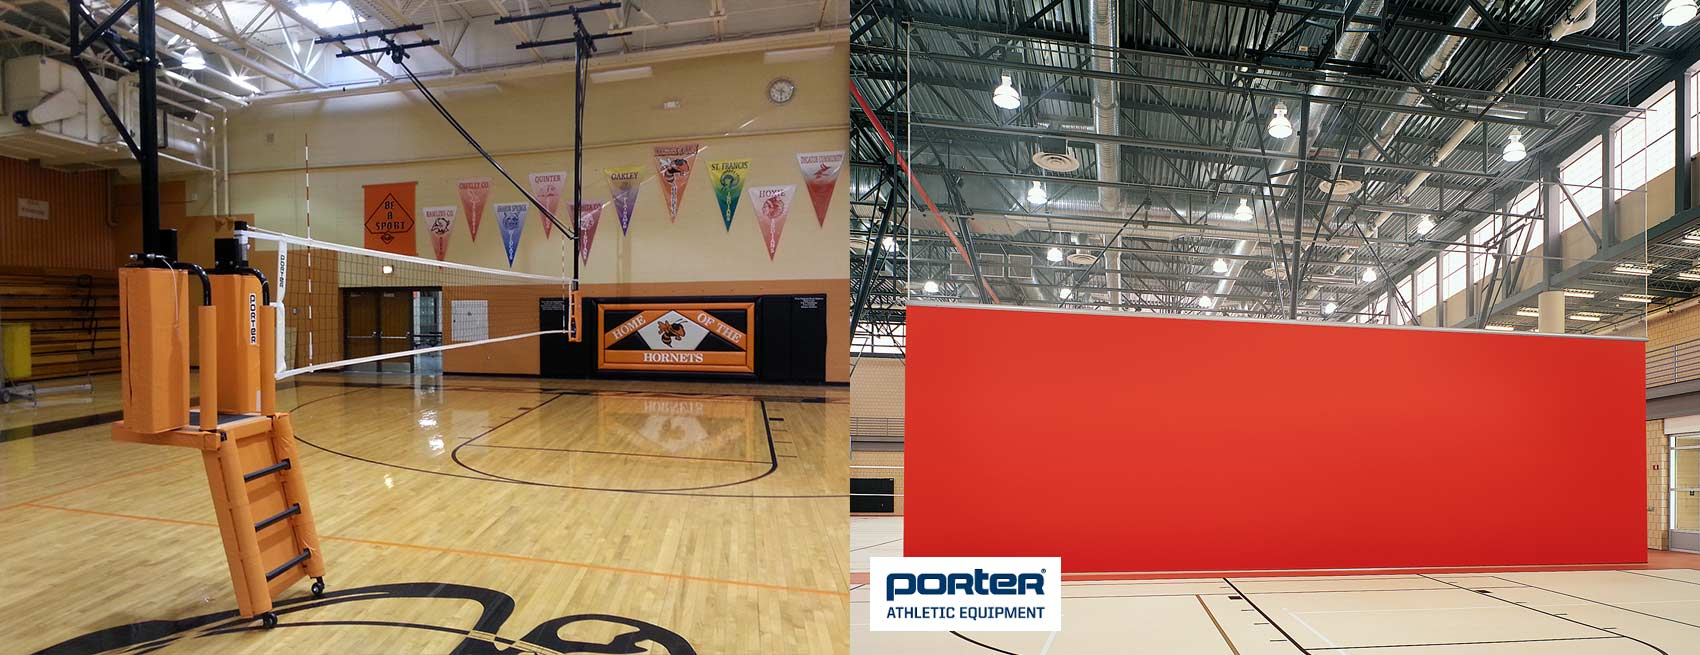 porter-athletic-gymnasium-divider